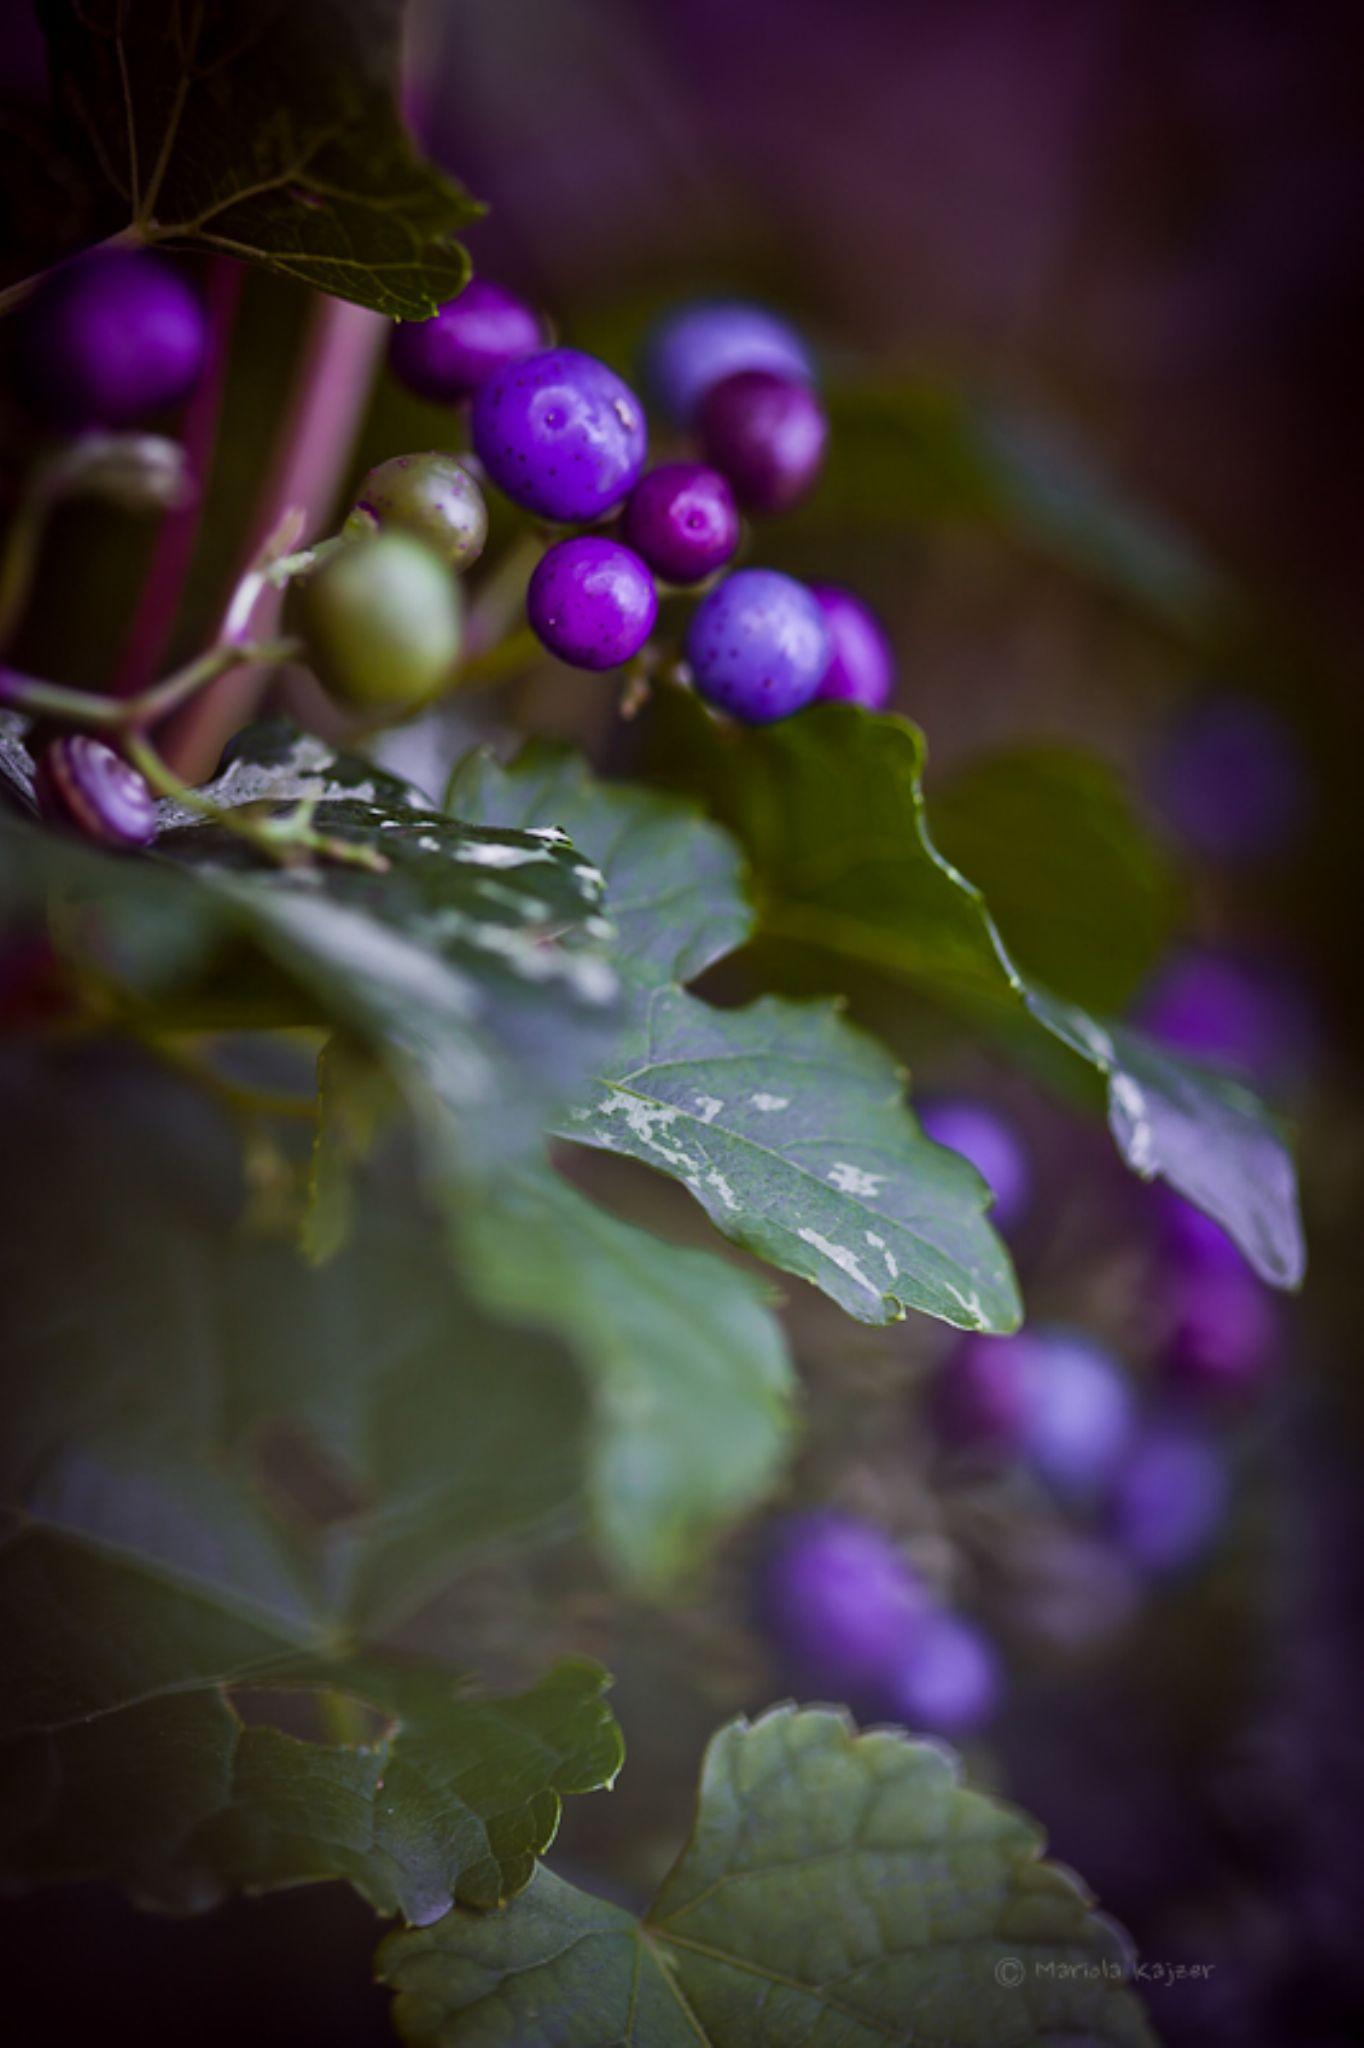 berry 3 by mariola.kajzer.1